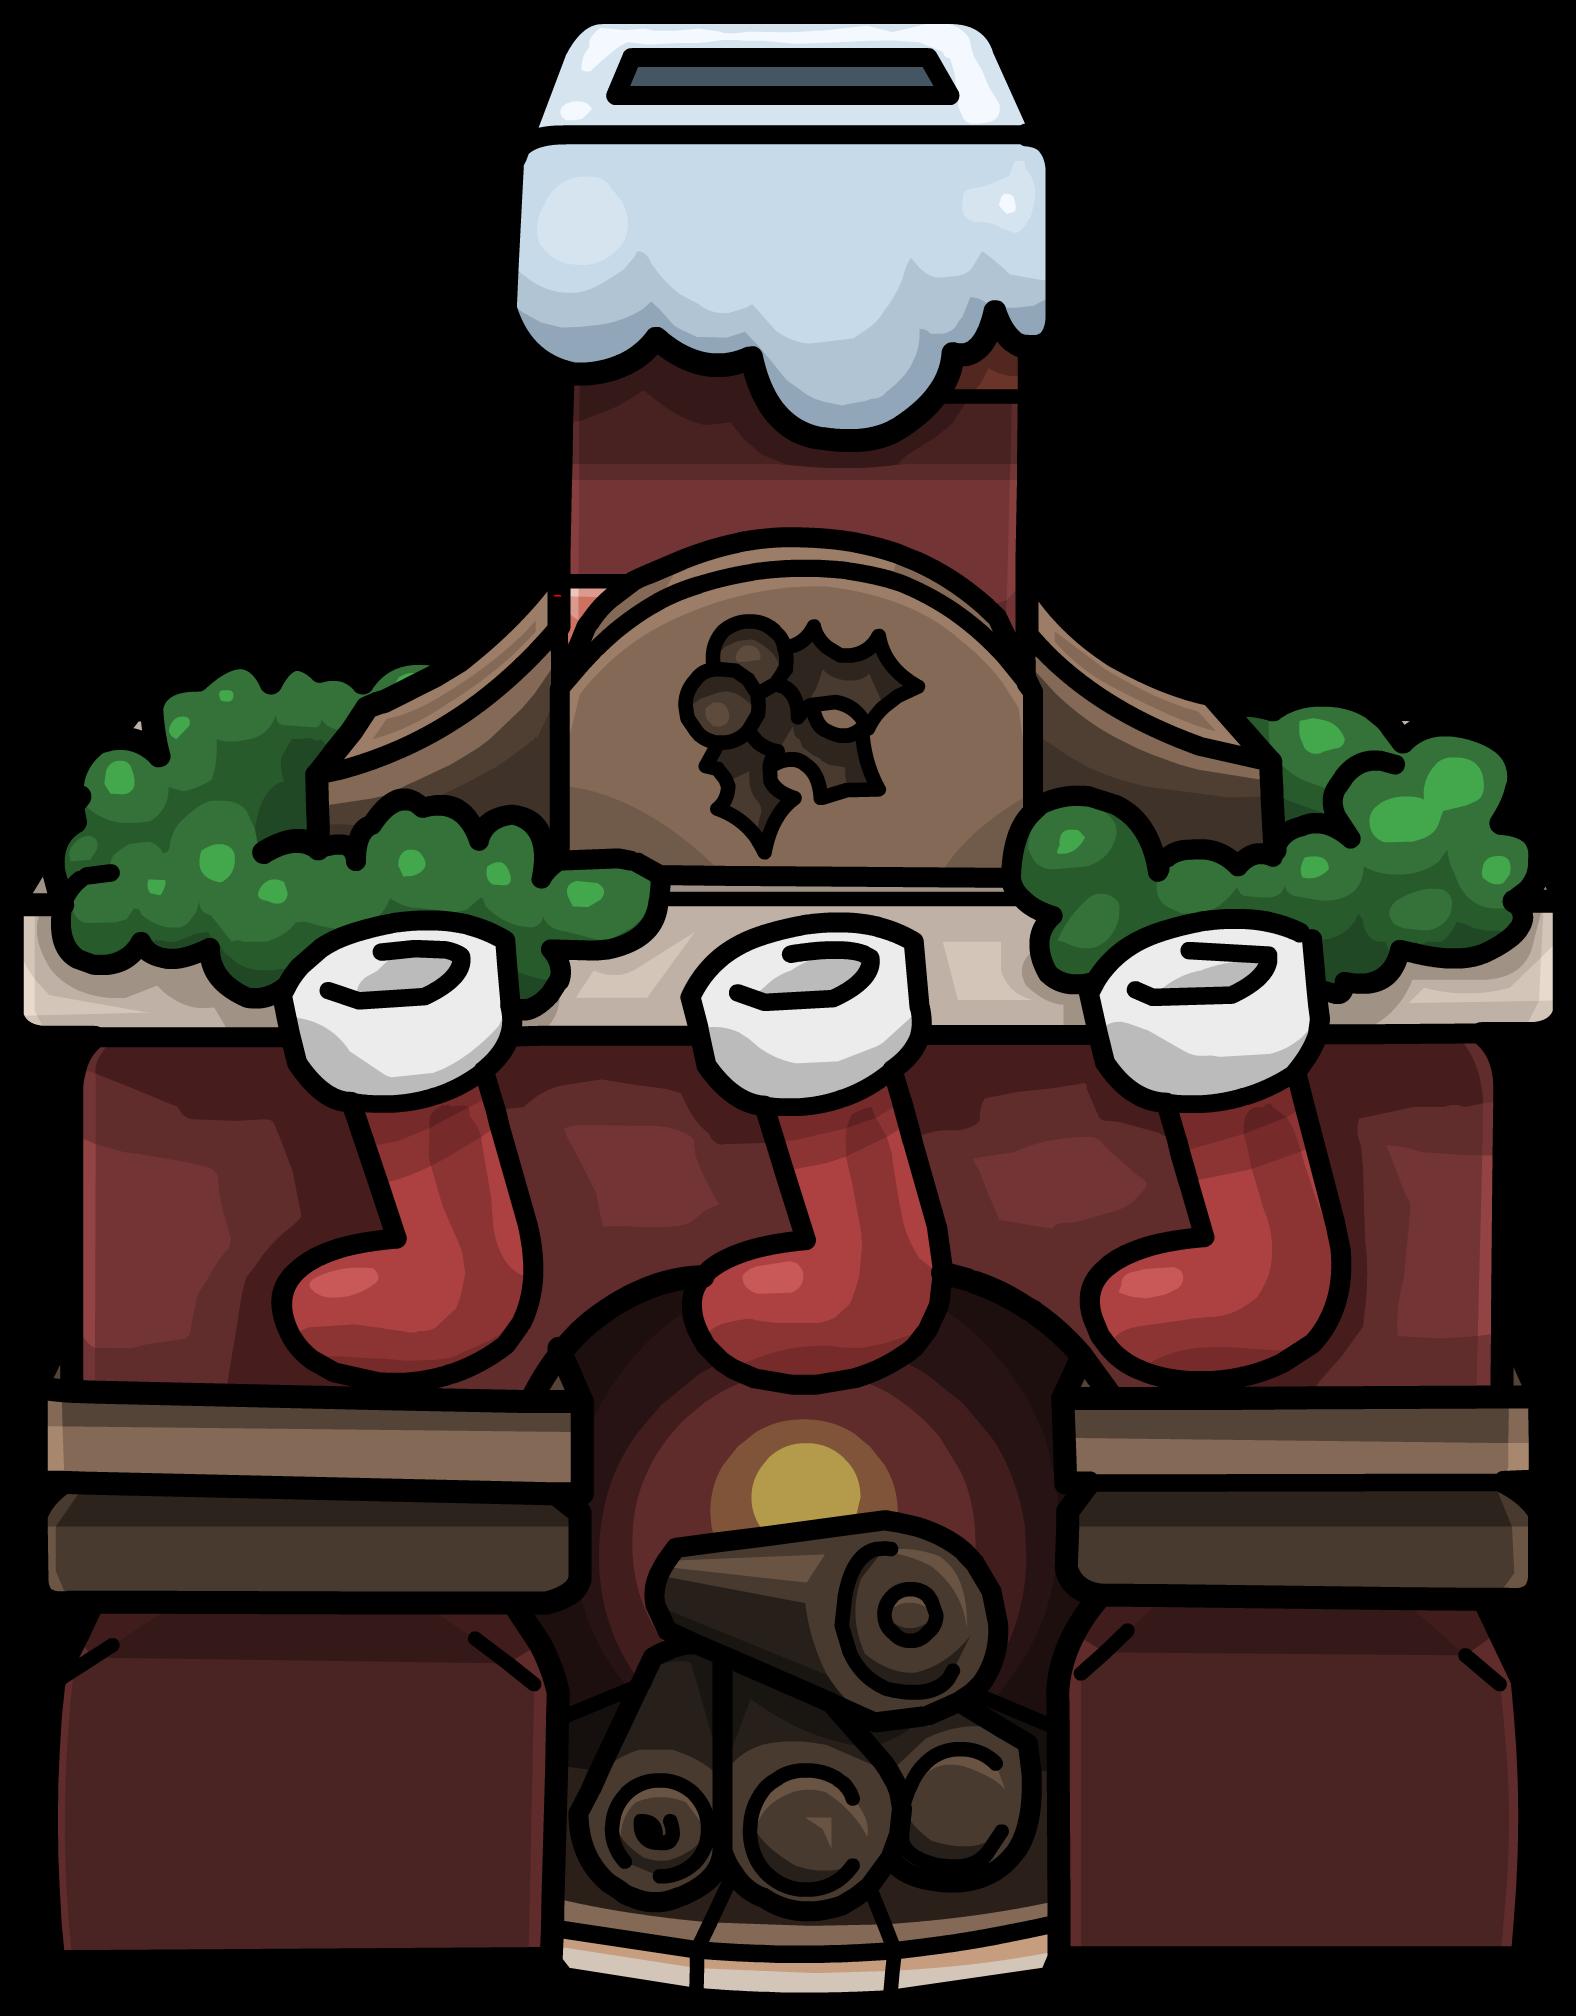 Fireplace clipart holiday Club by FANDOM Fireplace Fireplace